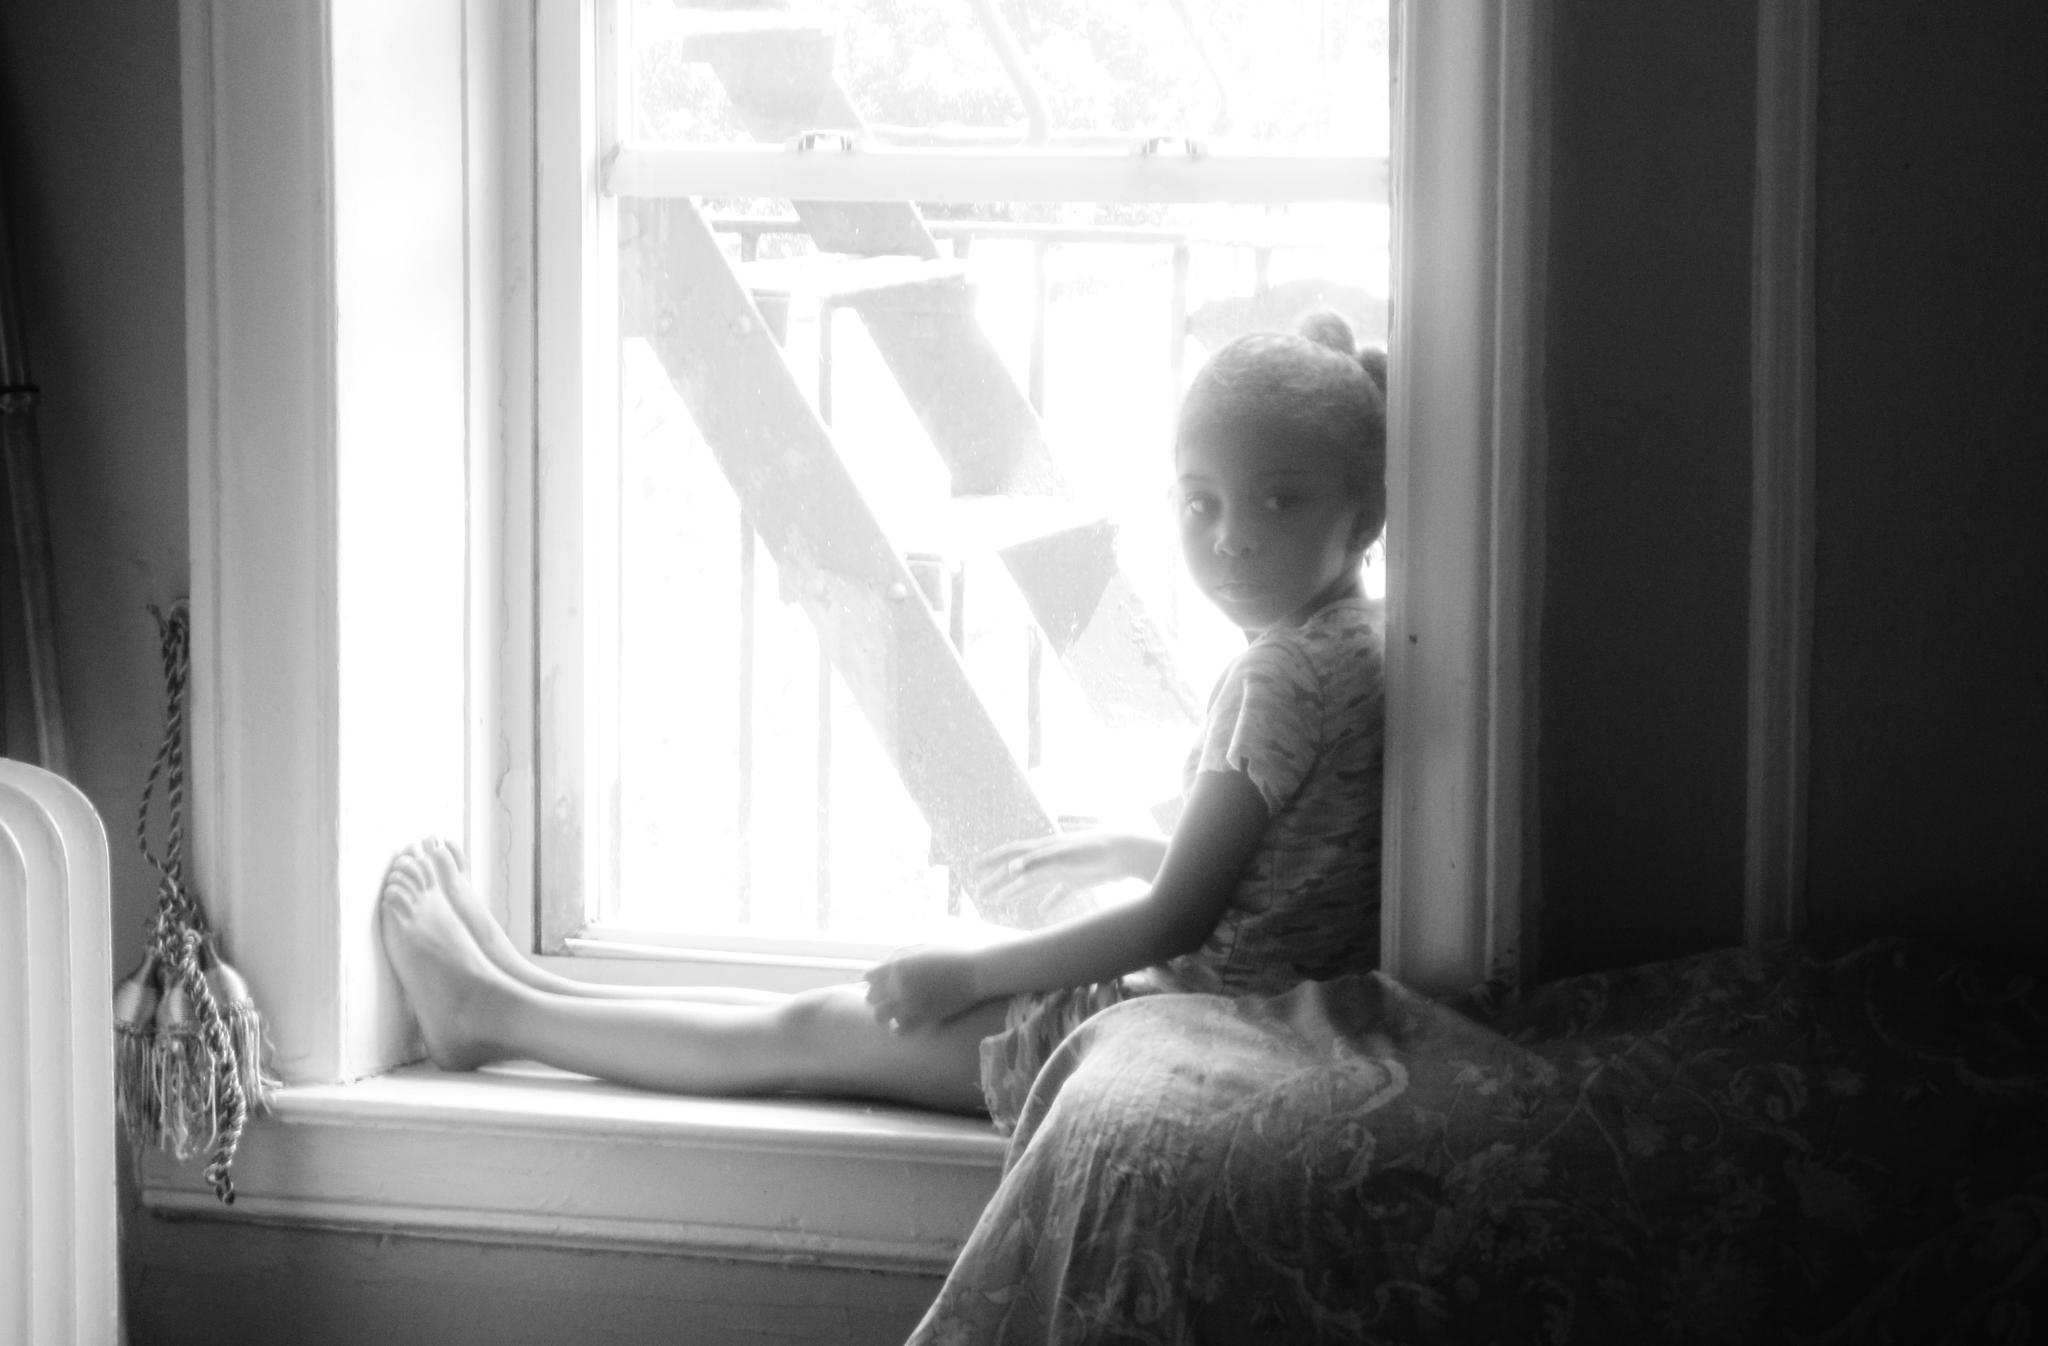 Little Girl, Big City by cgsahar